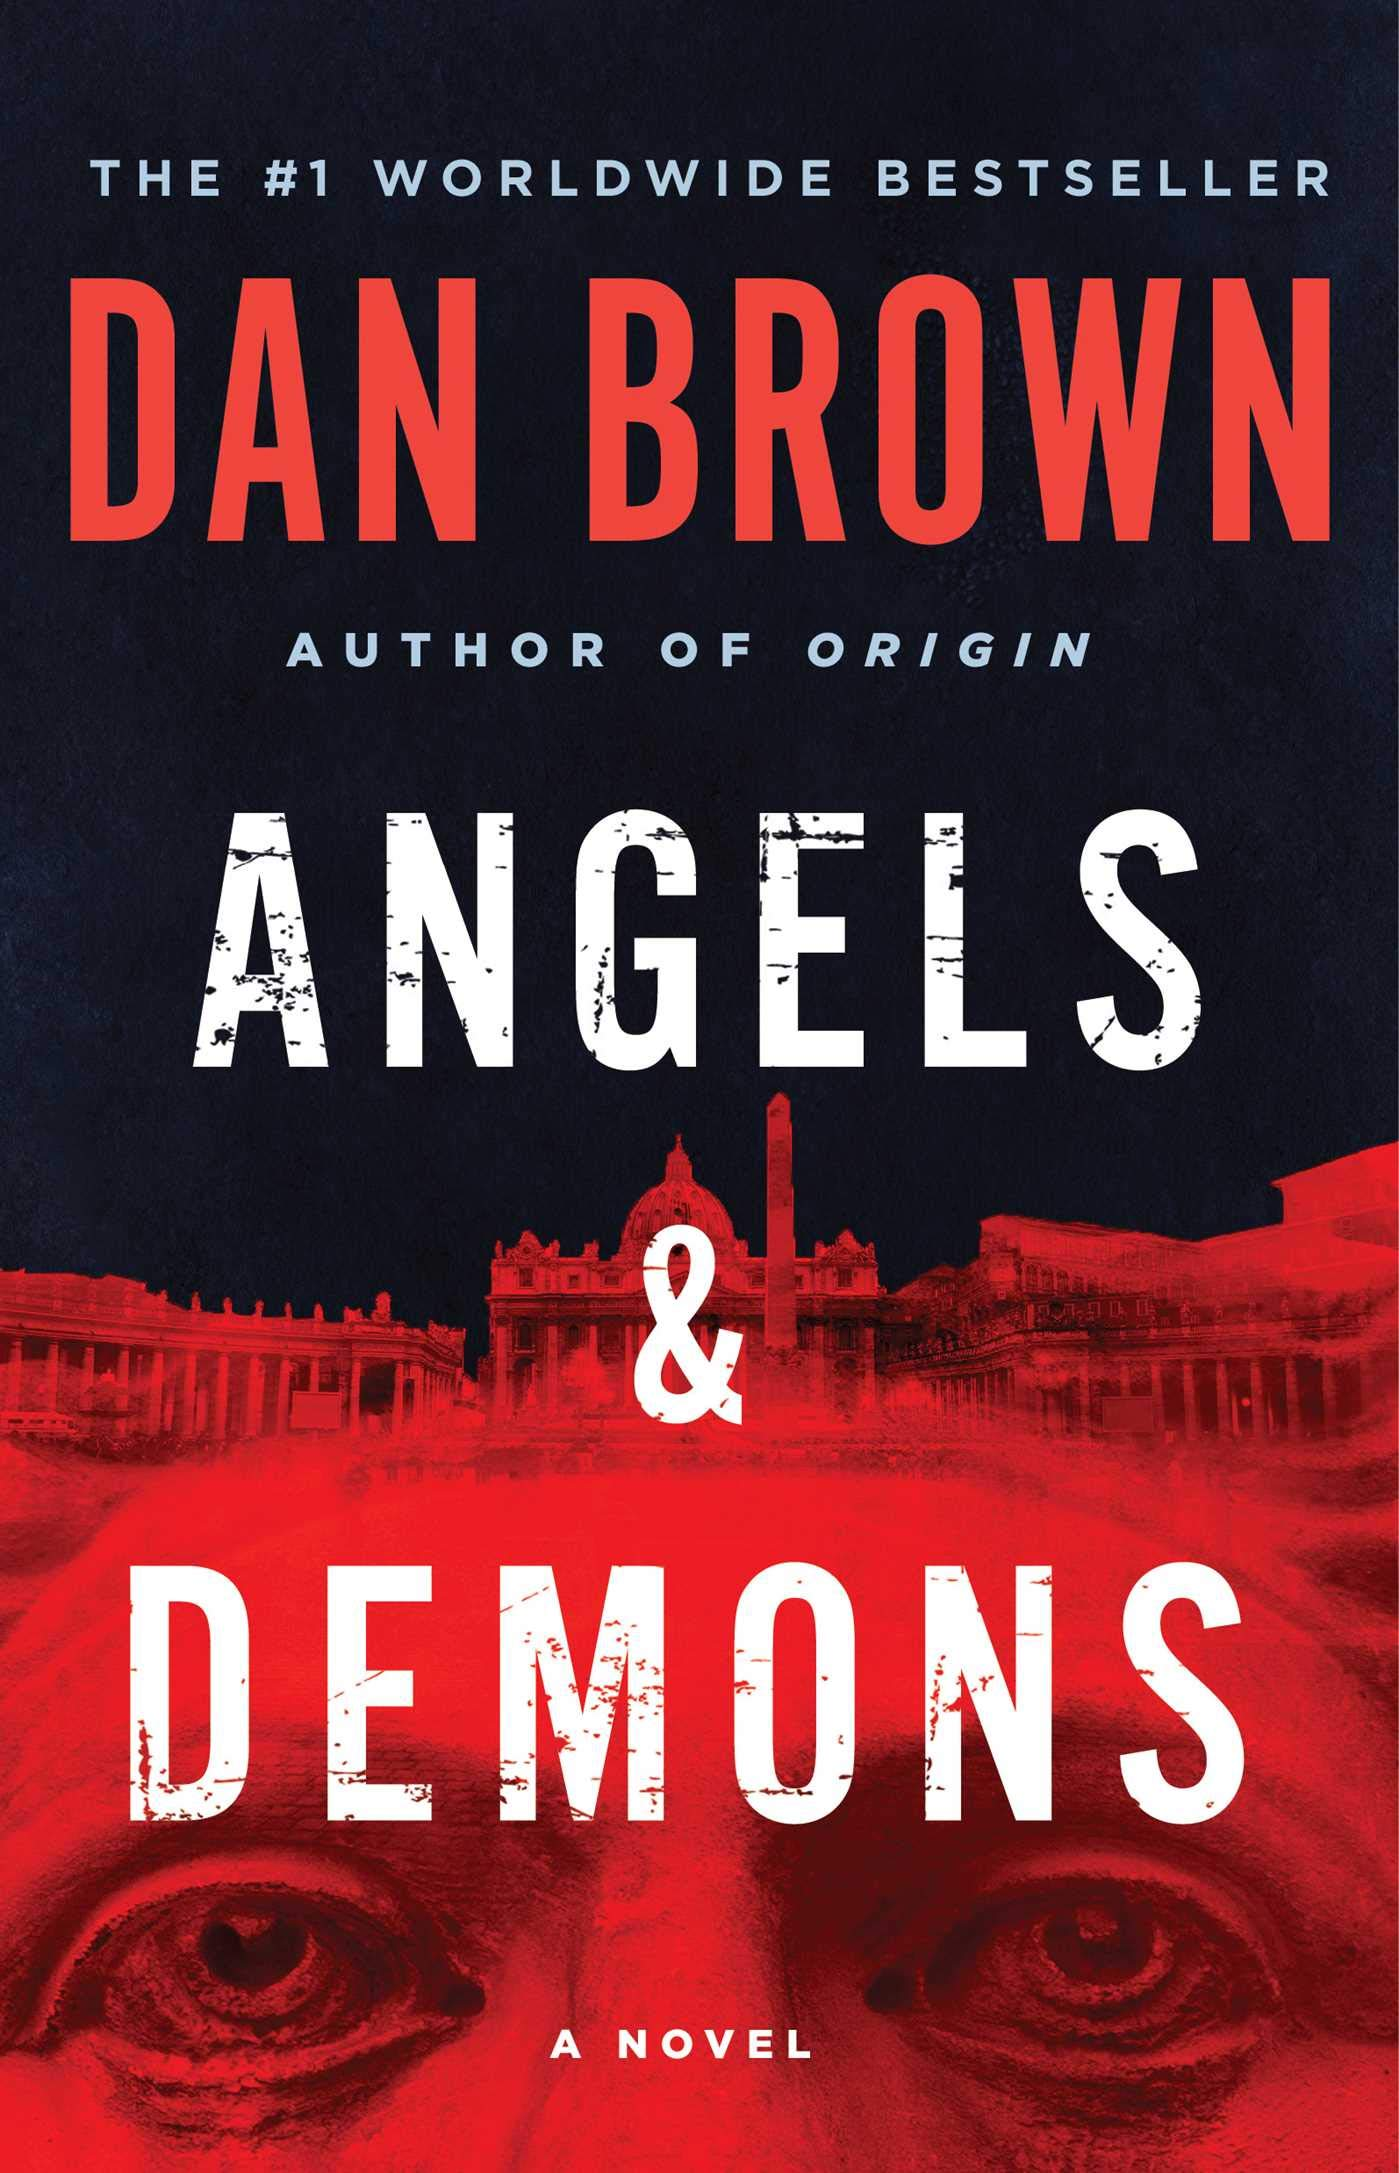 Angels & Demons A Novel Robert Langdon  Brown, Dan Amazon.de ...